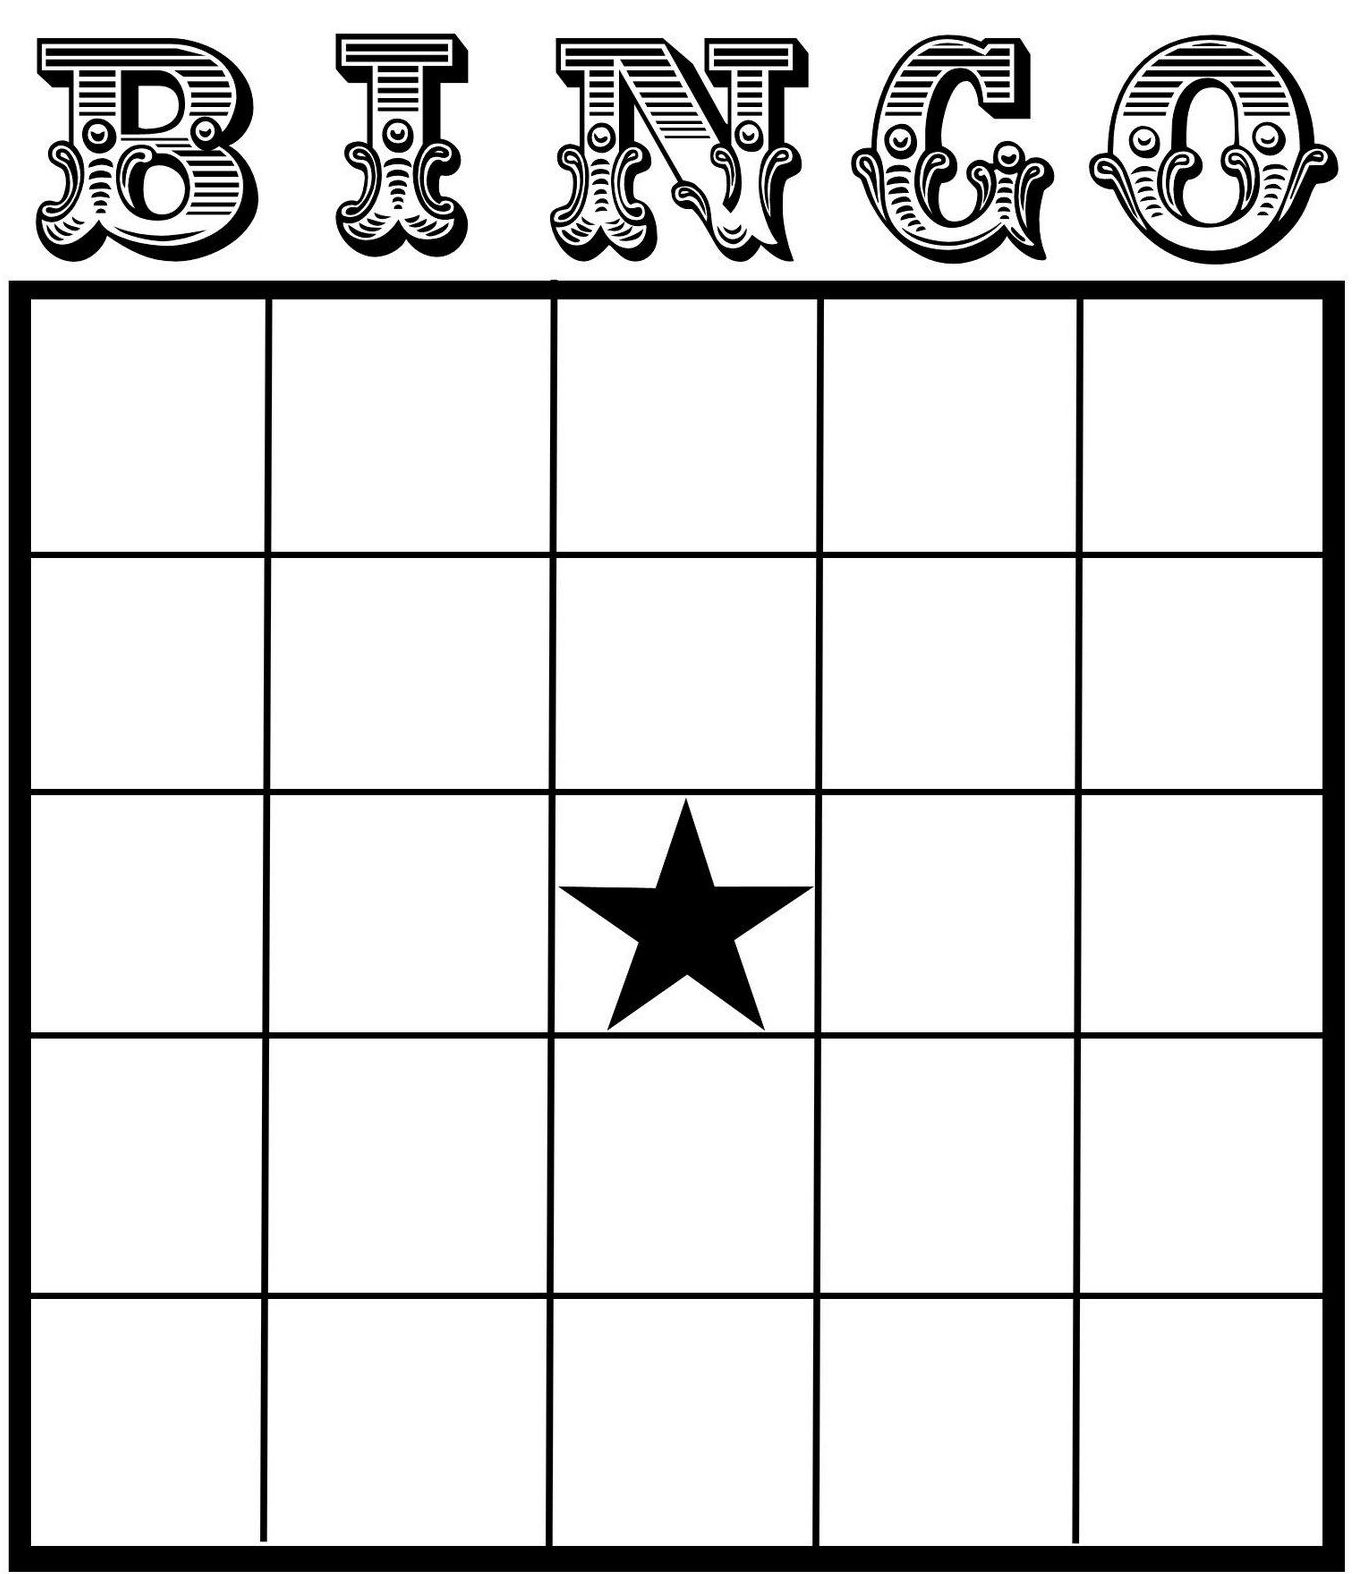 Free Printable Bingo Card Template - Set Your Plan & Tasks